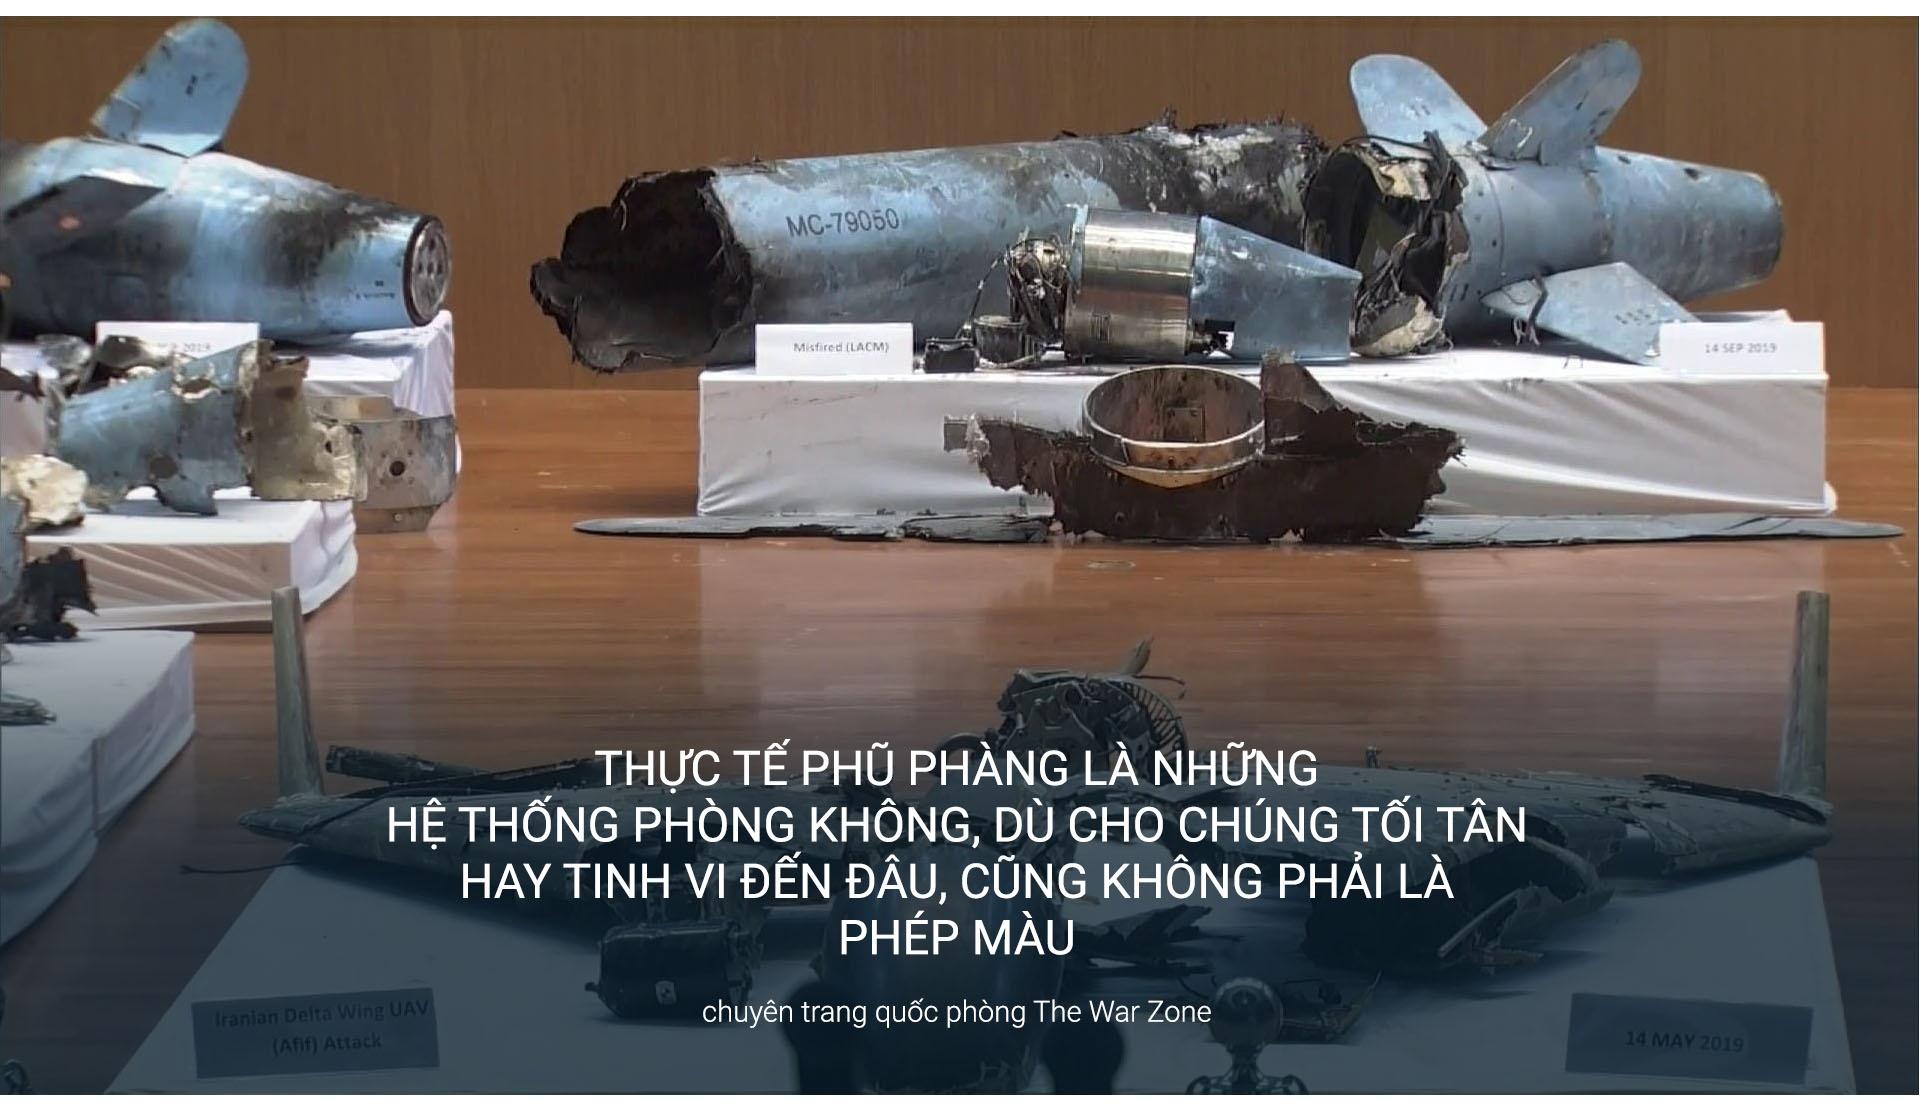 Patriot doi dau S-400 tai Trung Dong anh 12